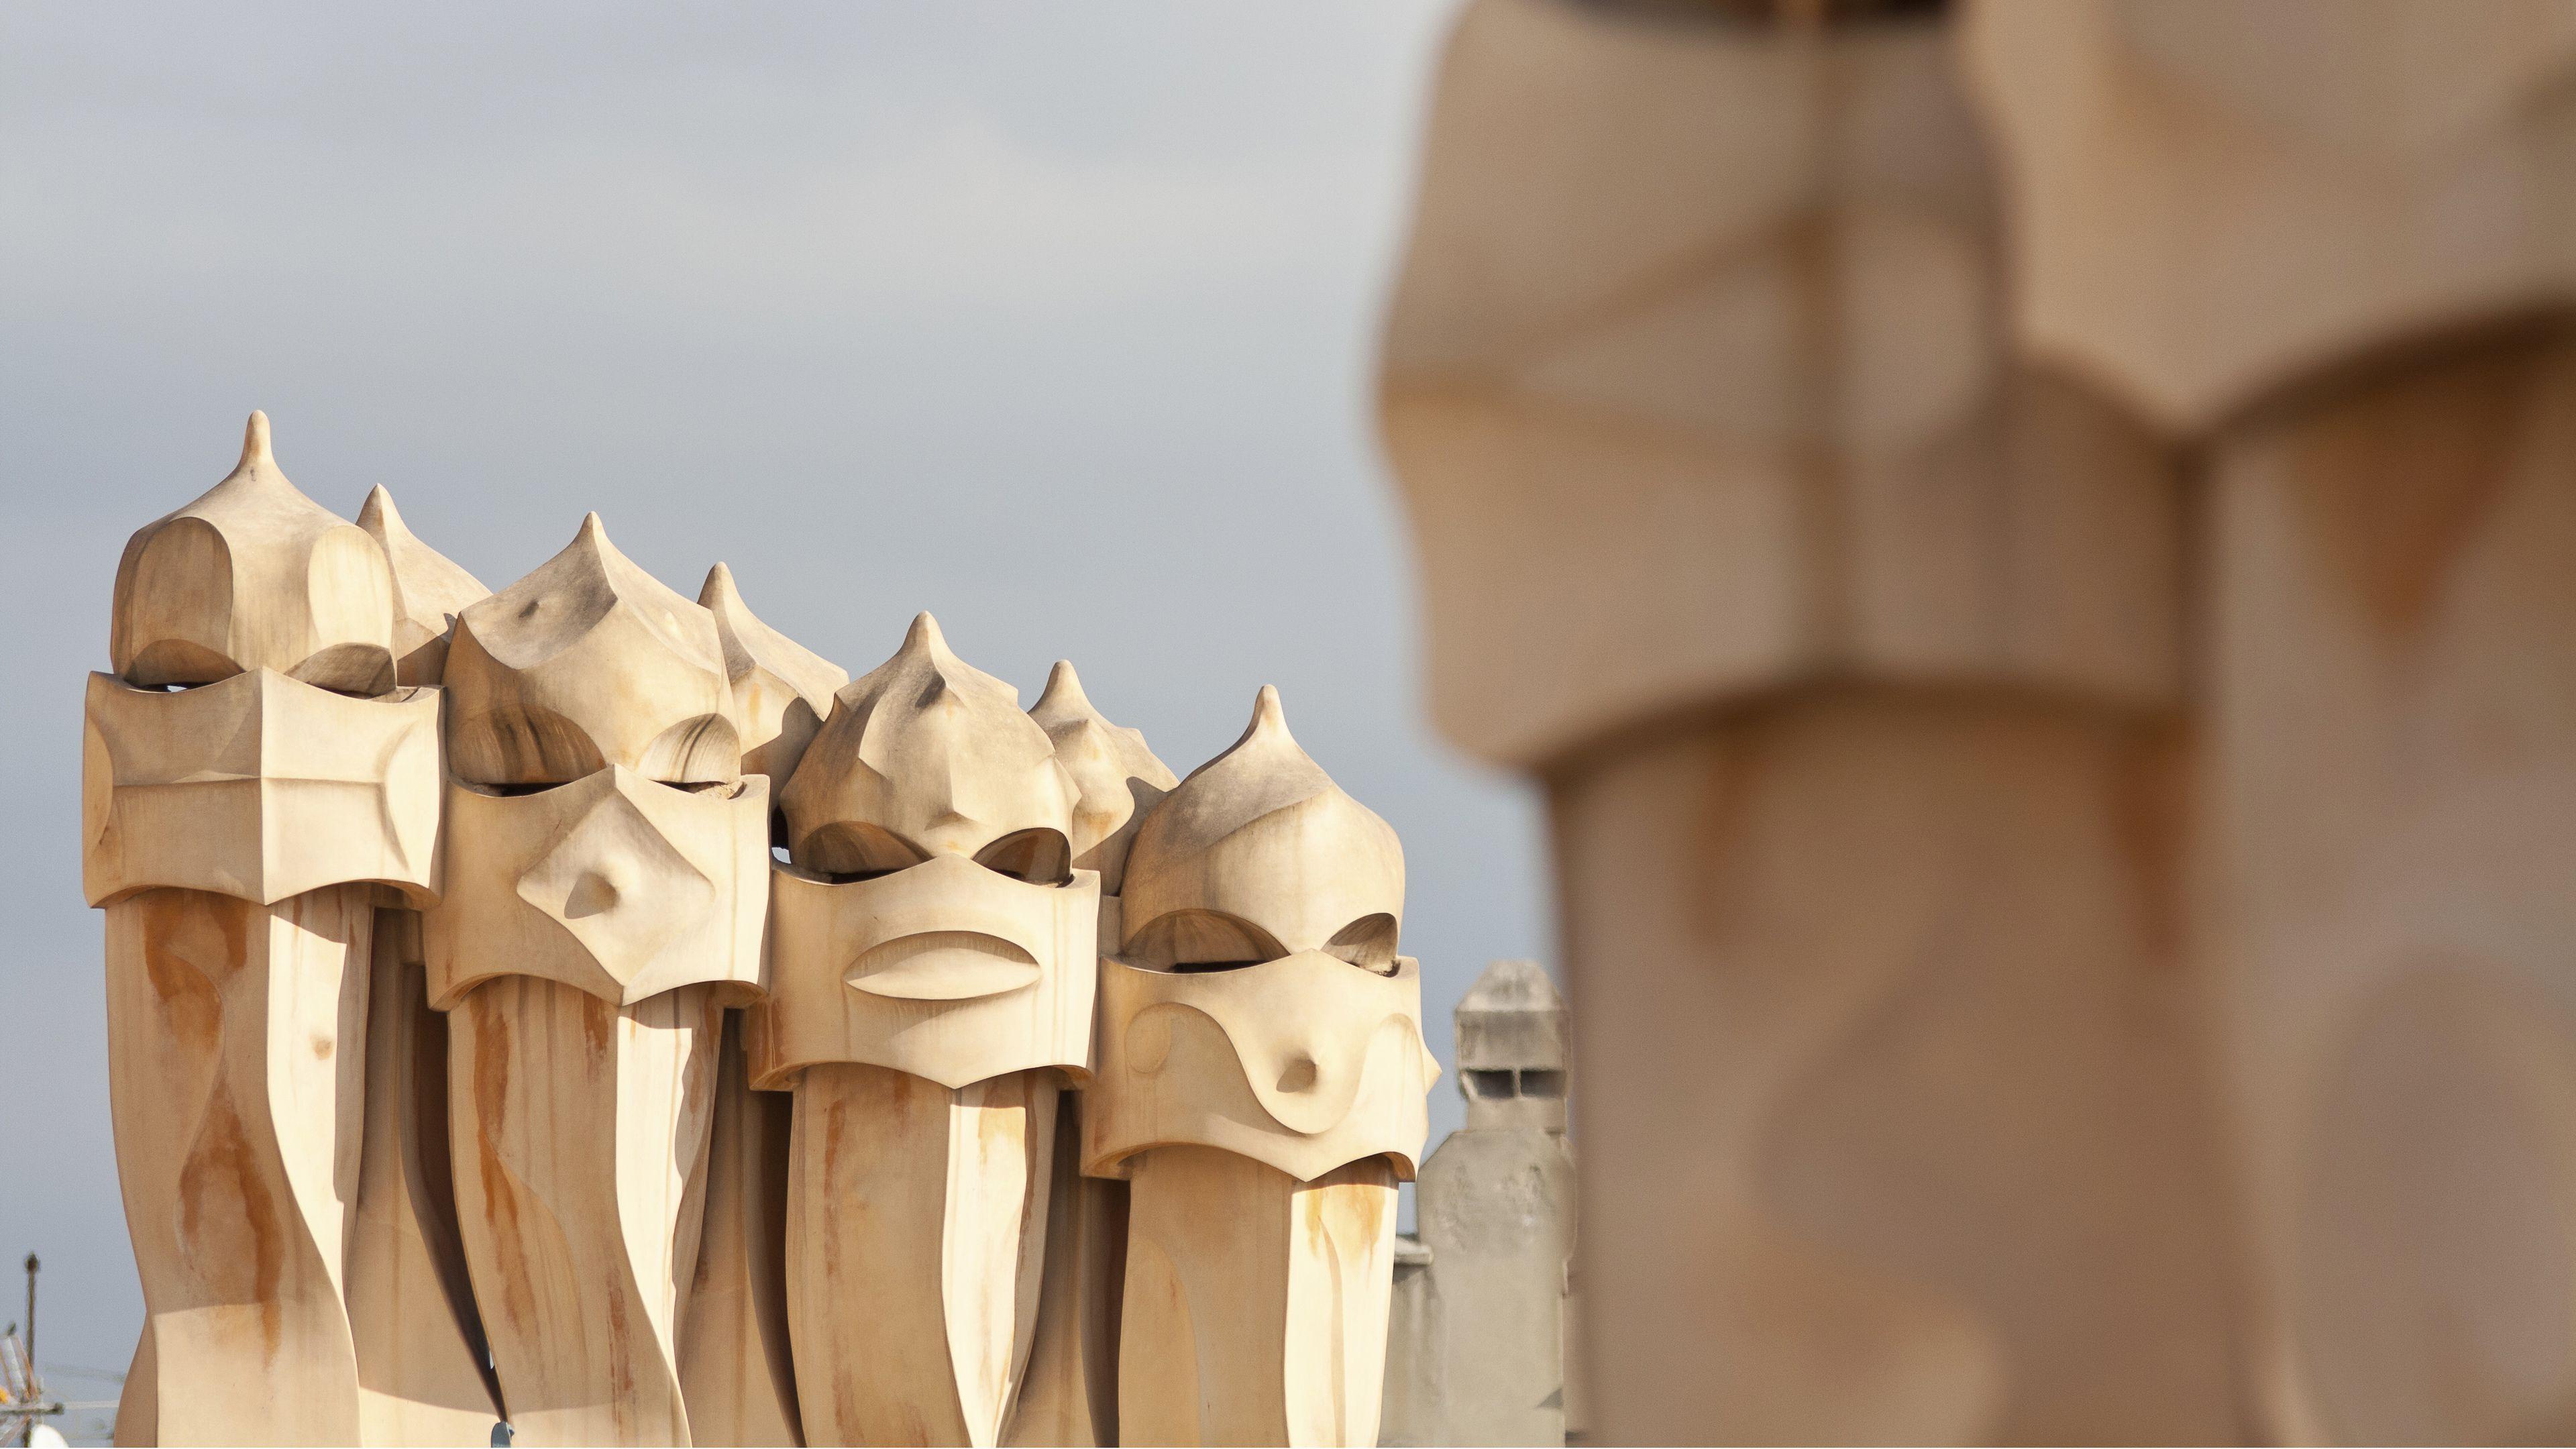 sculpture detail at Casa Mila in Barcelona